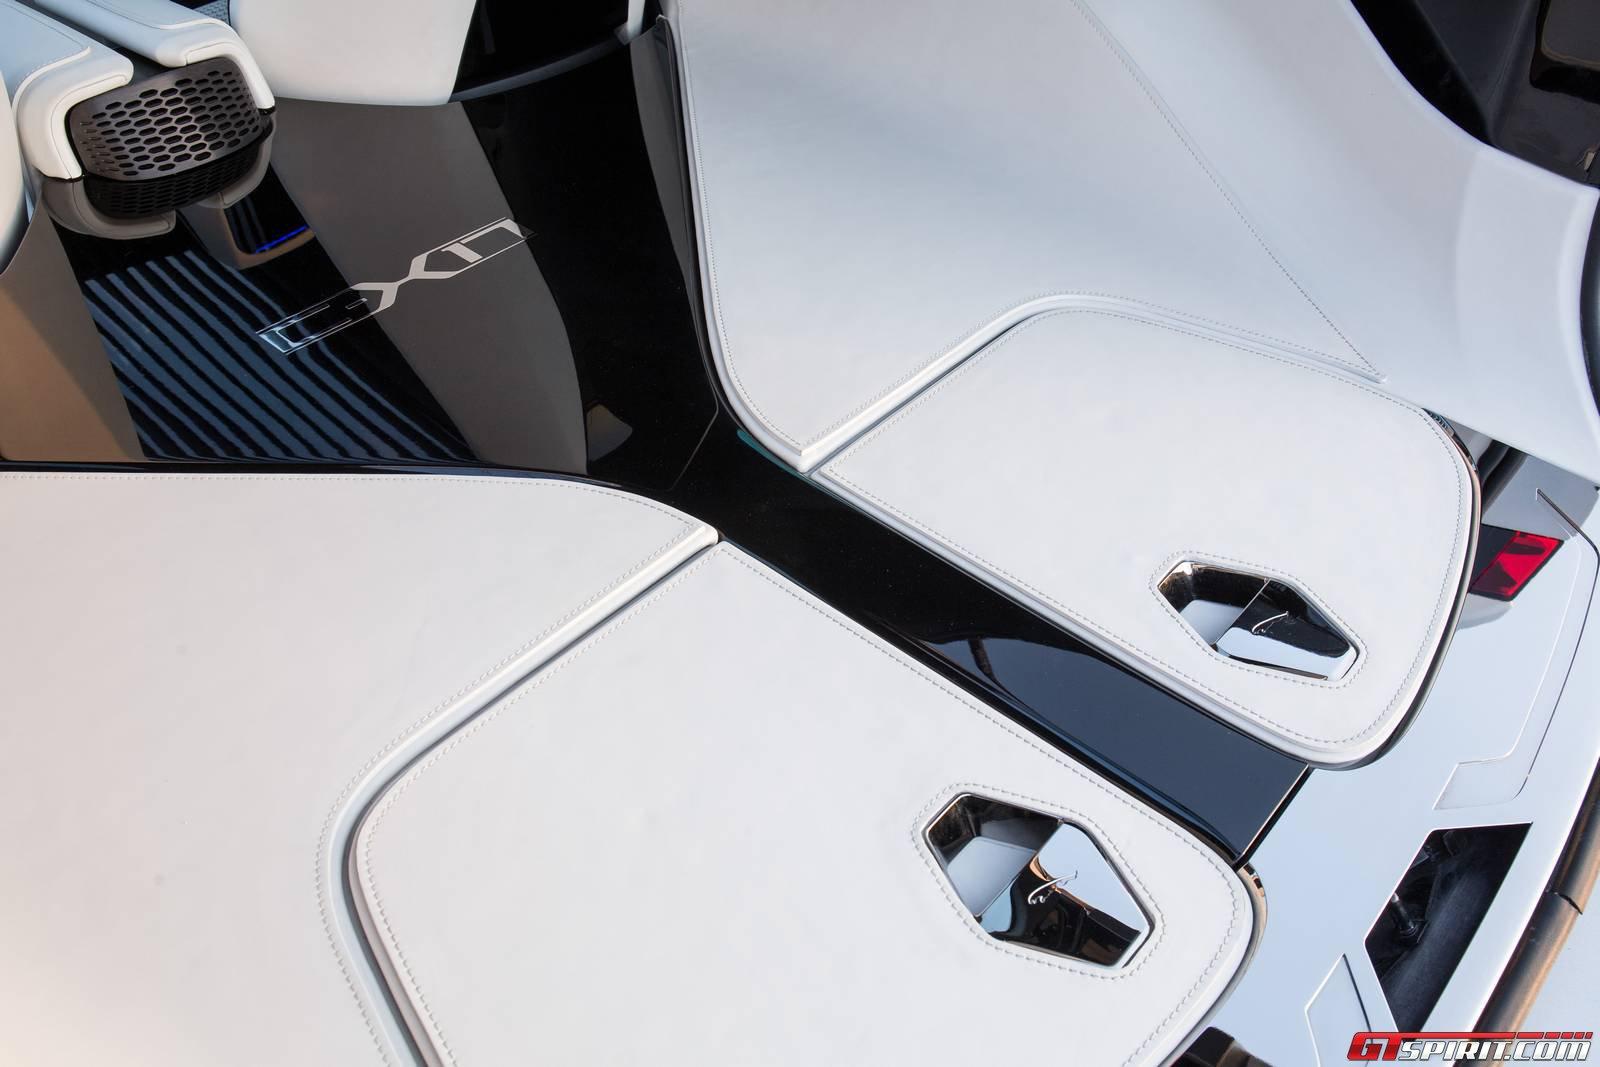 jaguar c-x17 dubai 007